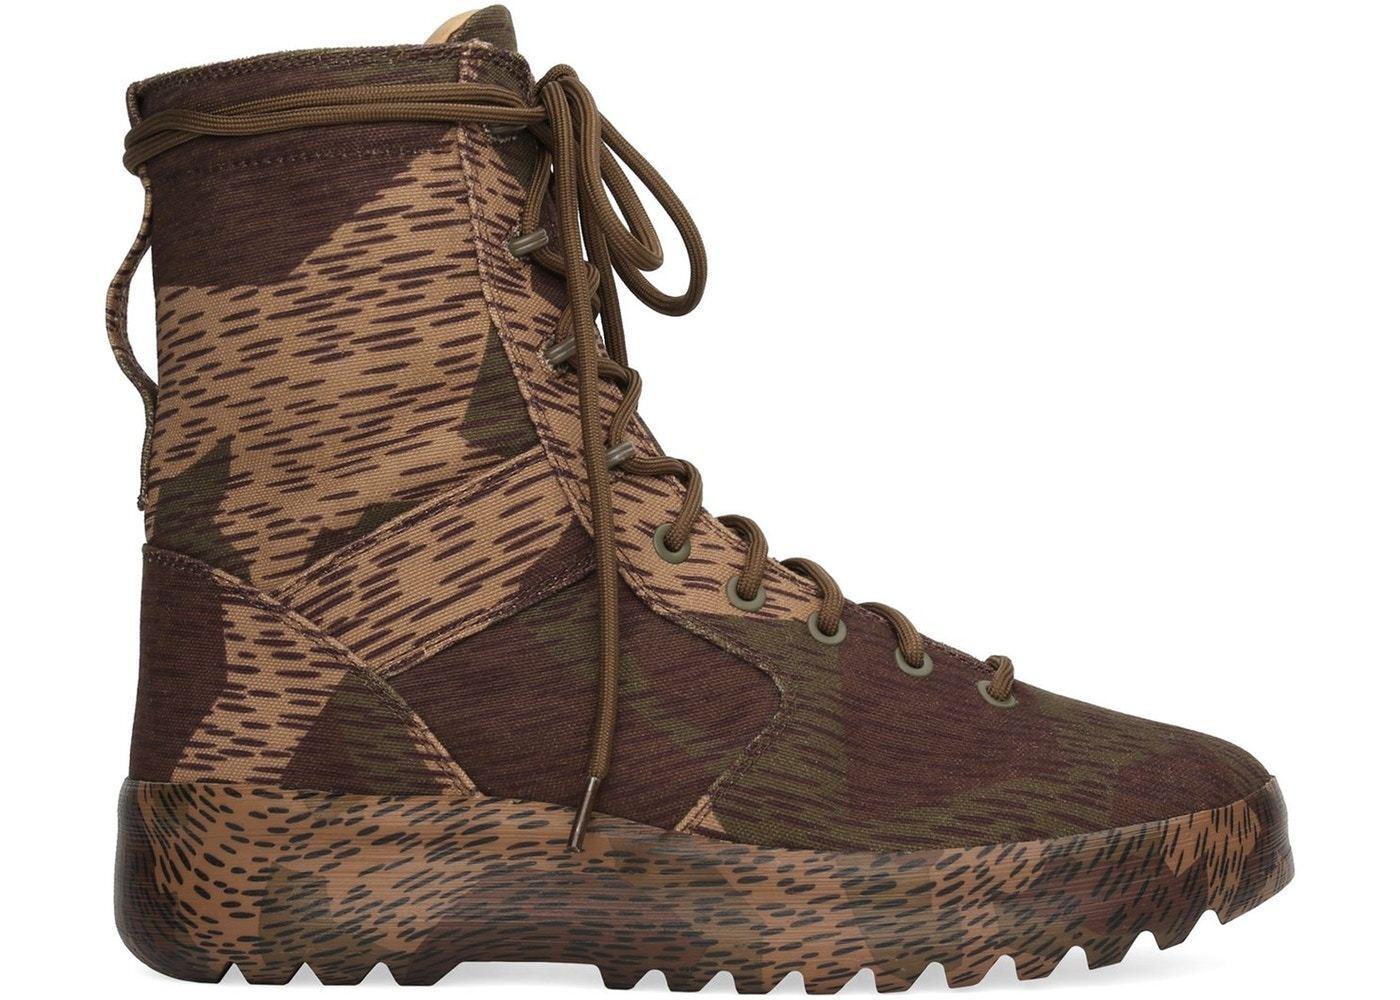 Yeezy Washed Canvas Military Boot Season 6 Splinter Camo Size 8.